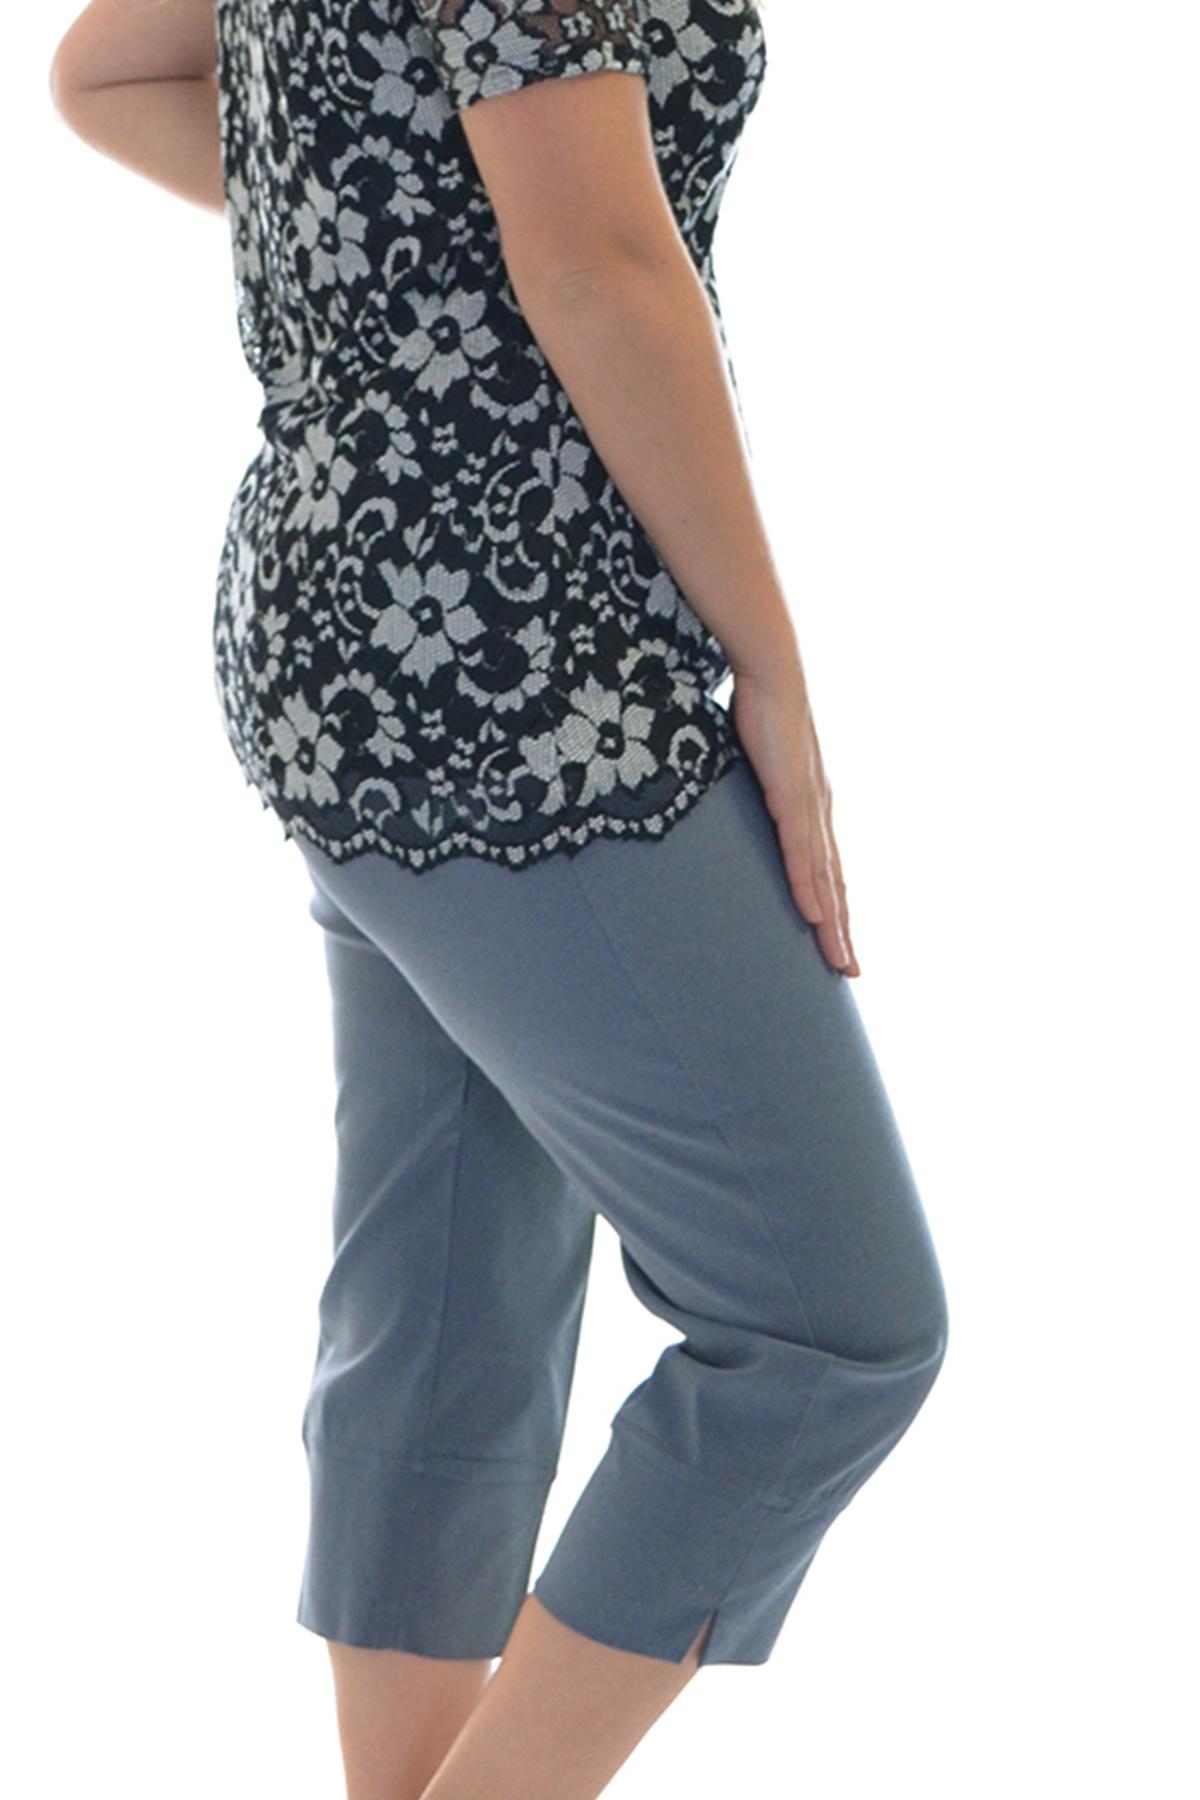 New Womens Trousers Ladies Plus Size Plain Pants Capri ...